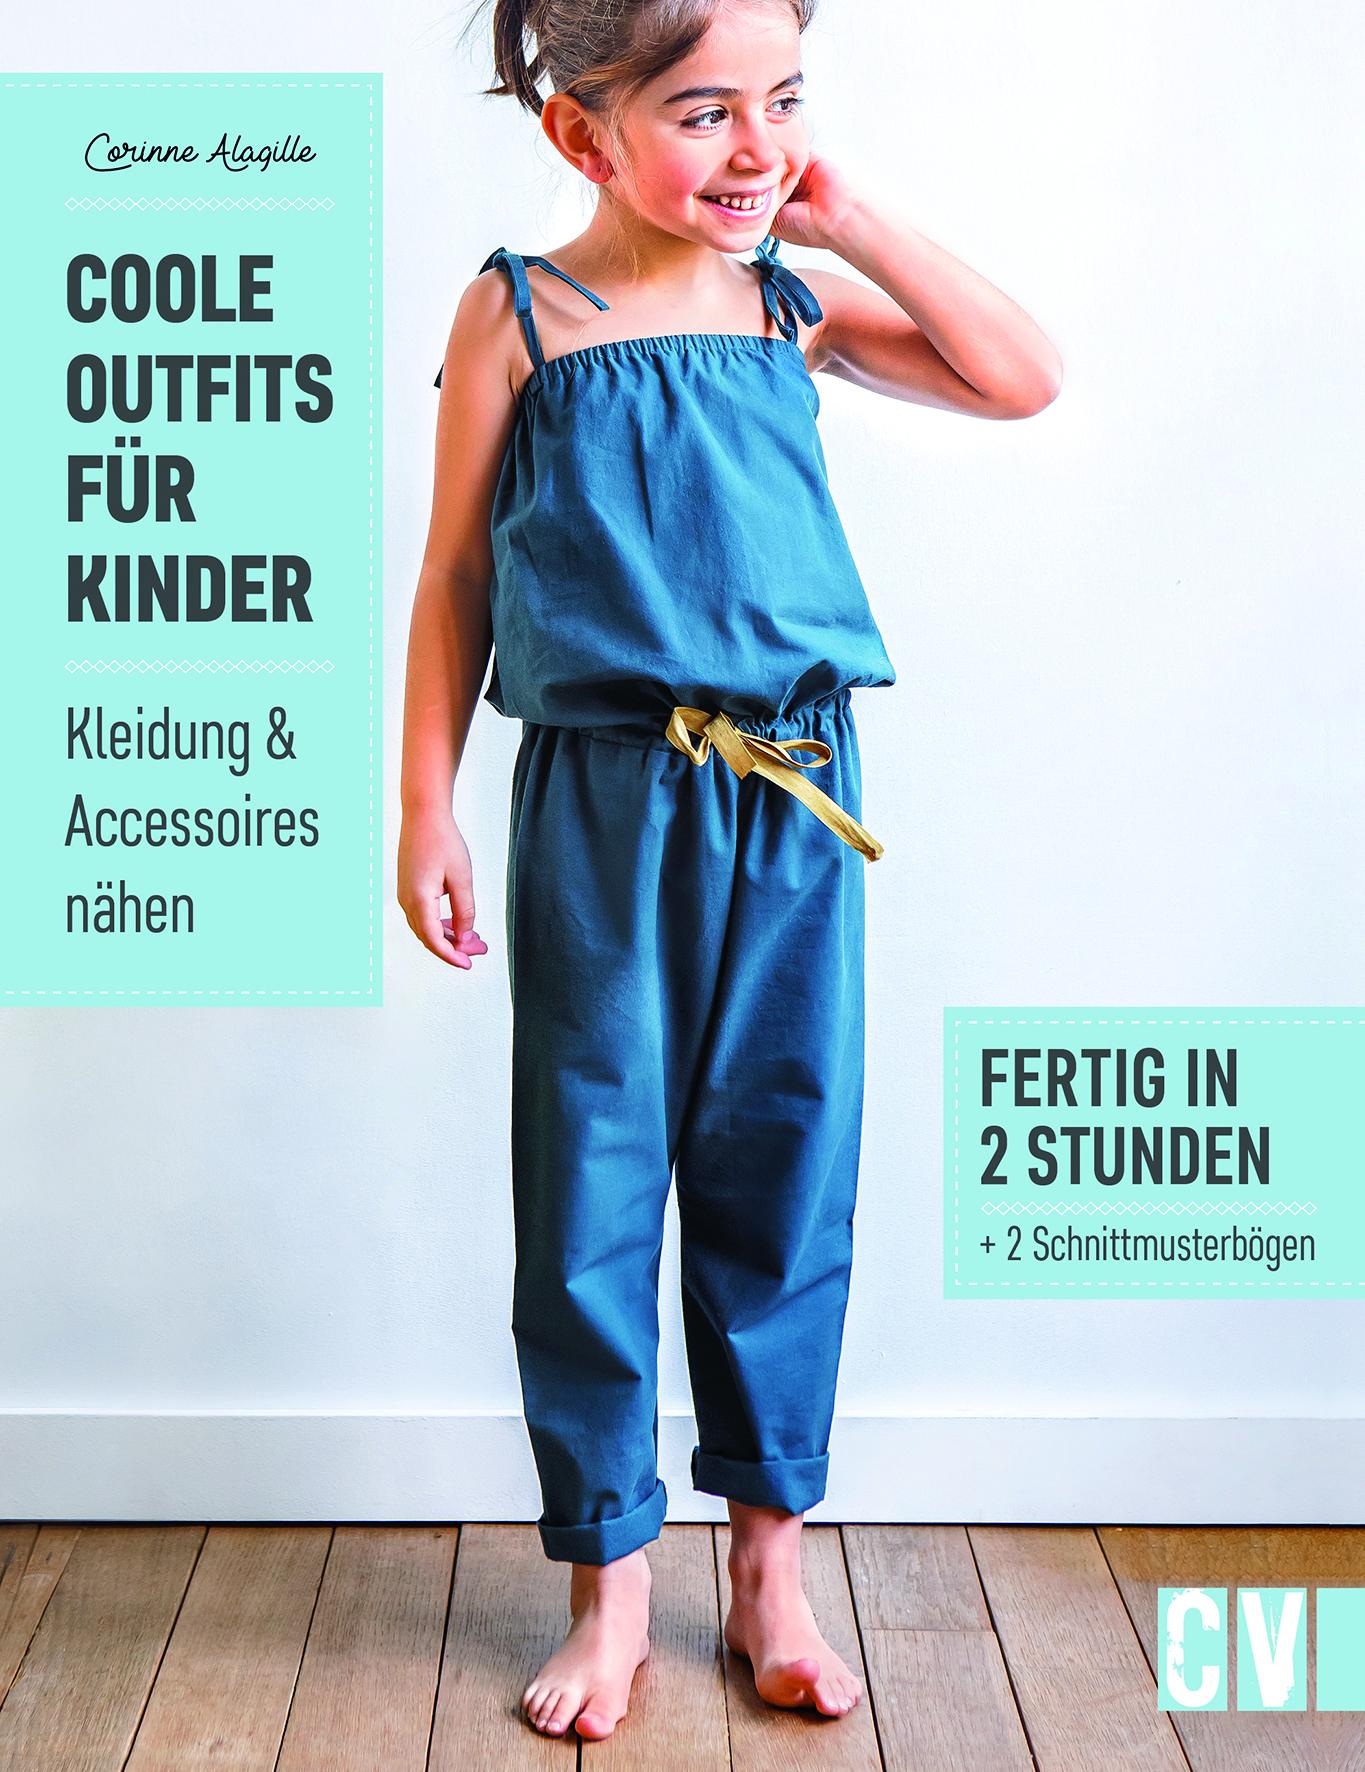 CV 6616 Coole Outfits für Kinder